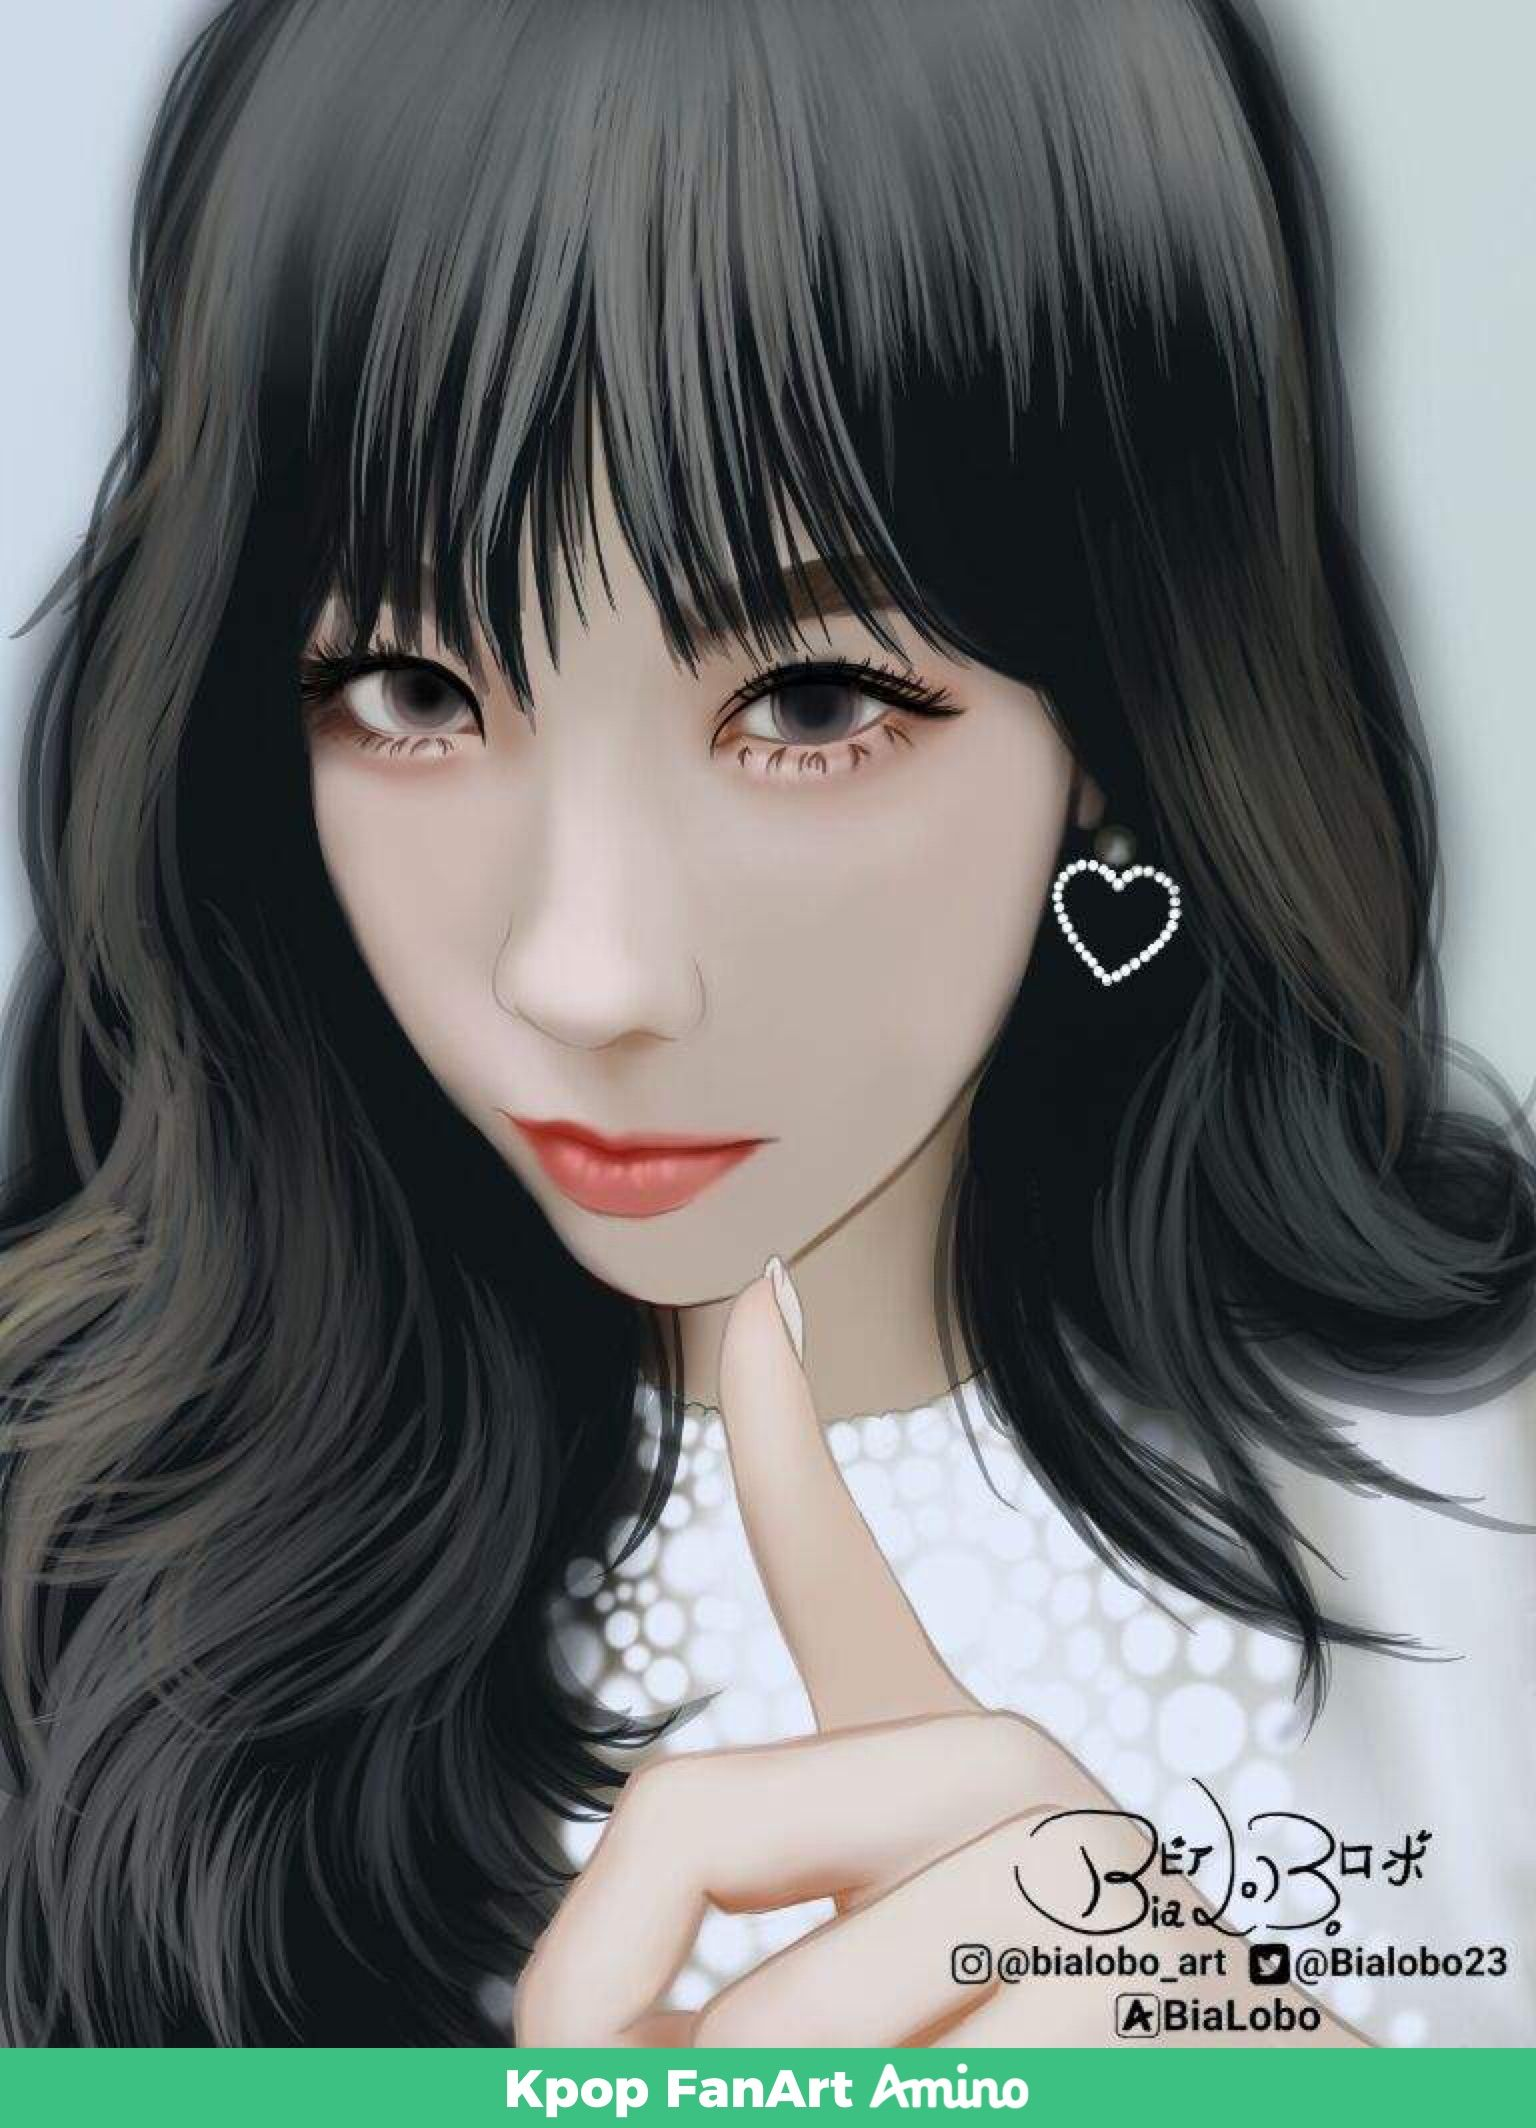 Pin By Teresa On Kpop Fanart Art Girl Taeyeon Korean Art